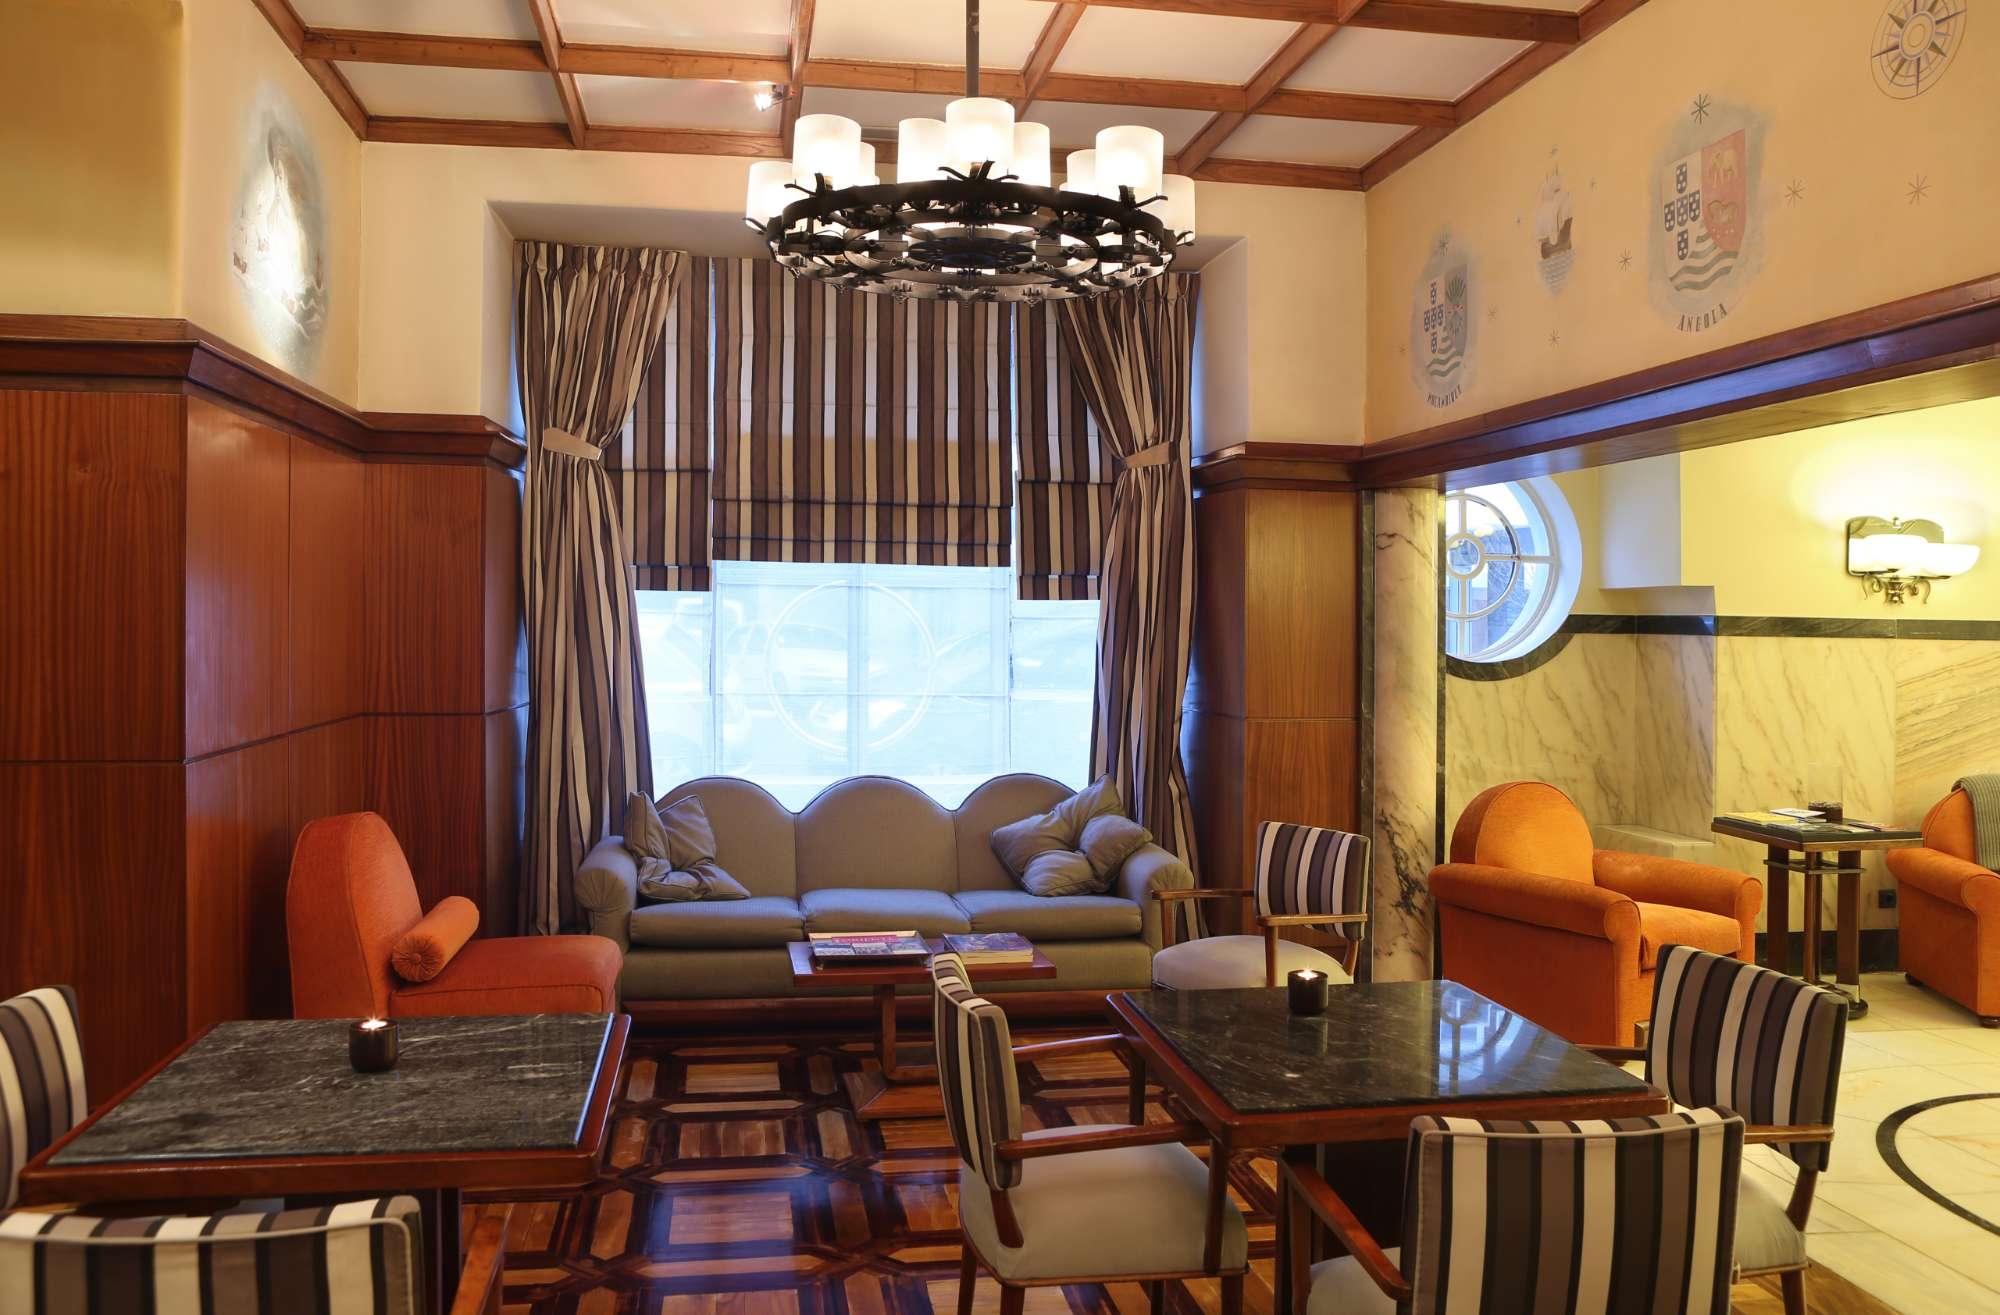 PF24270, Suite Residencial, Lisboa